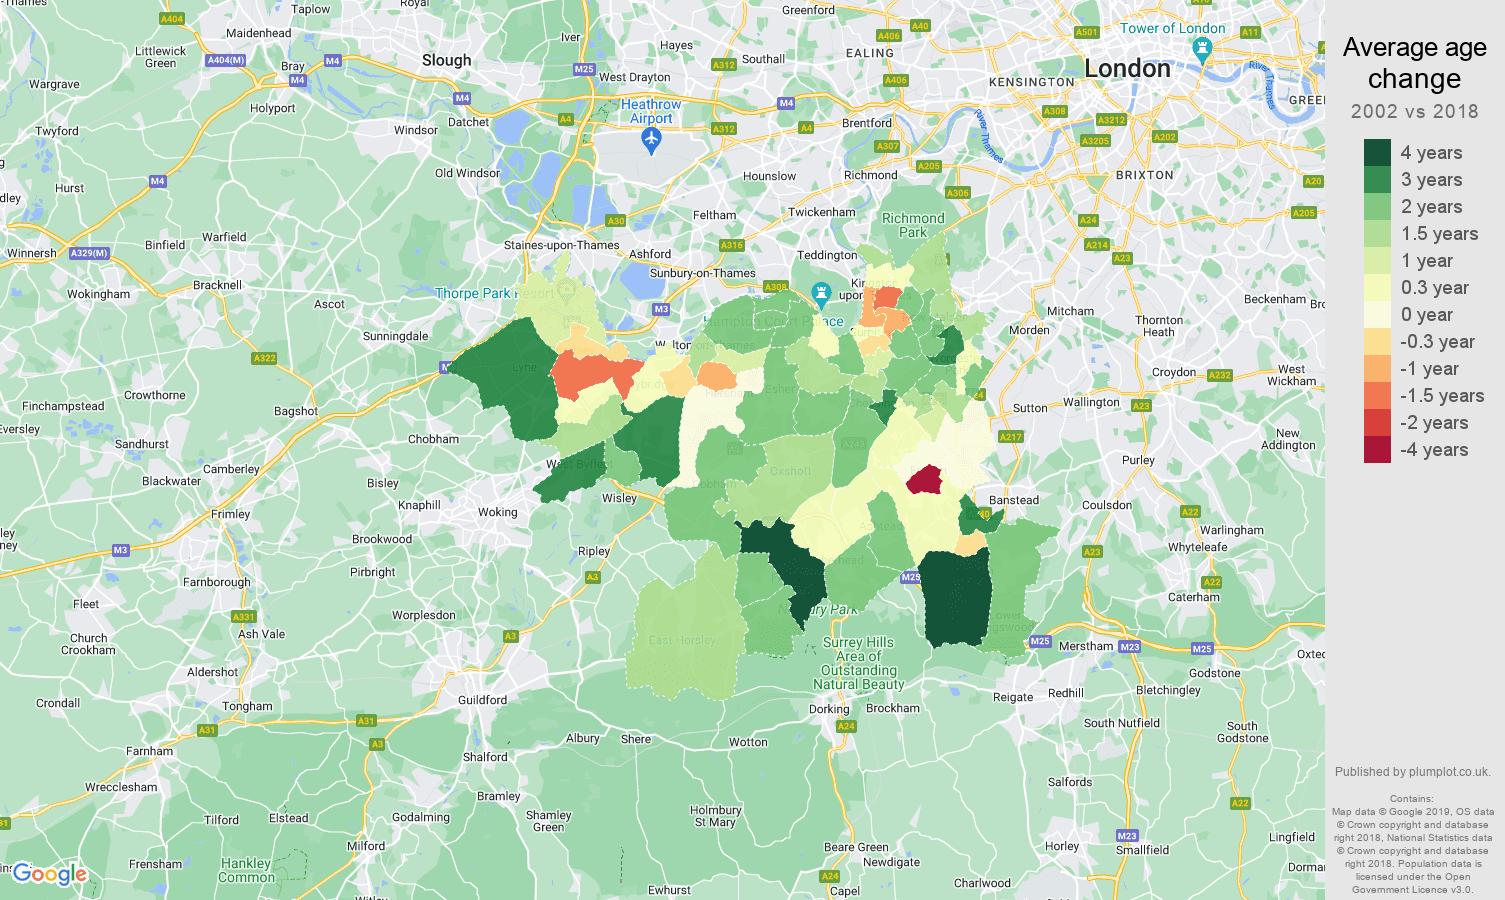 Kingston upon Thames average age change map